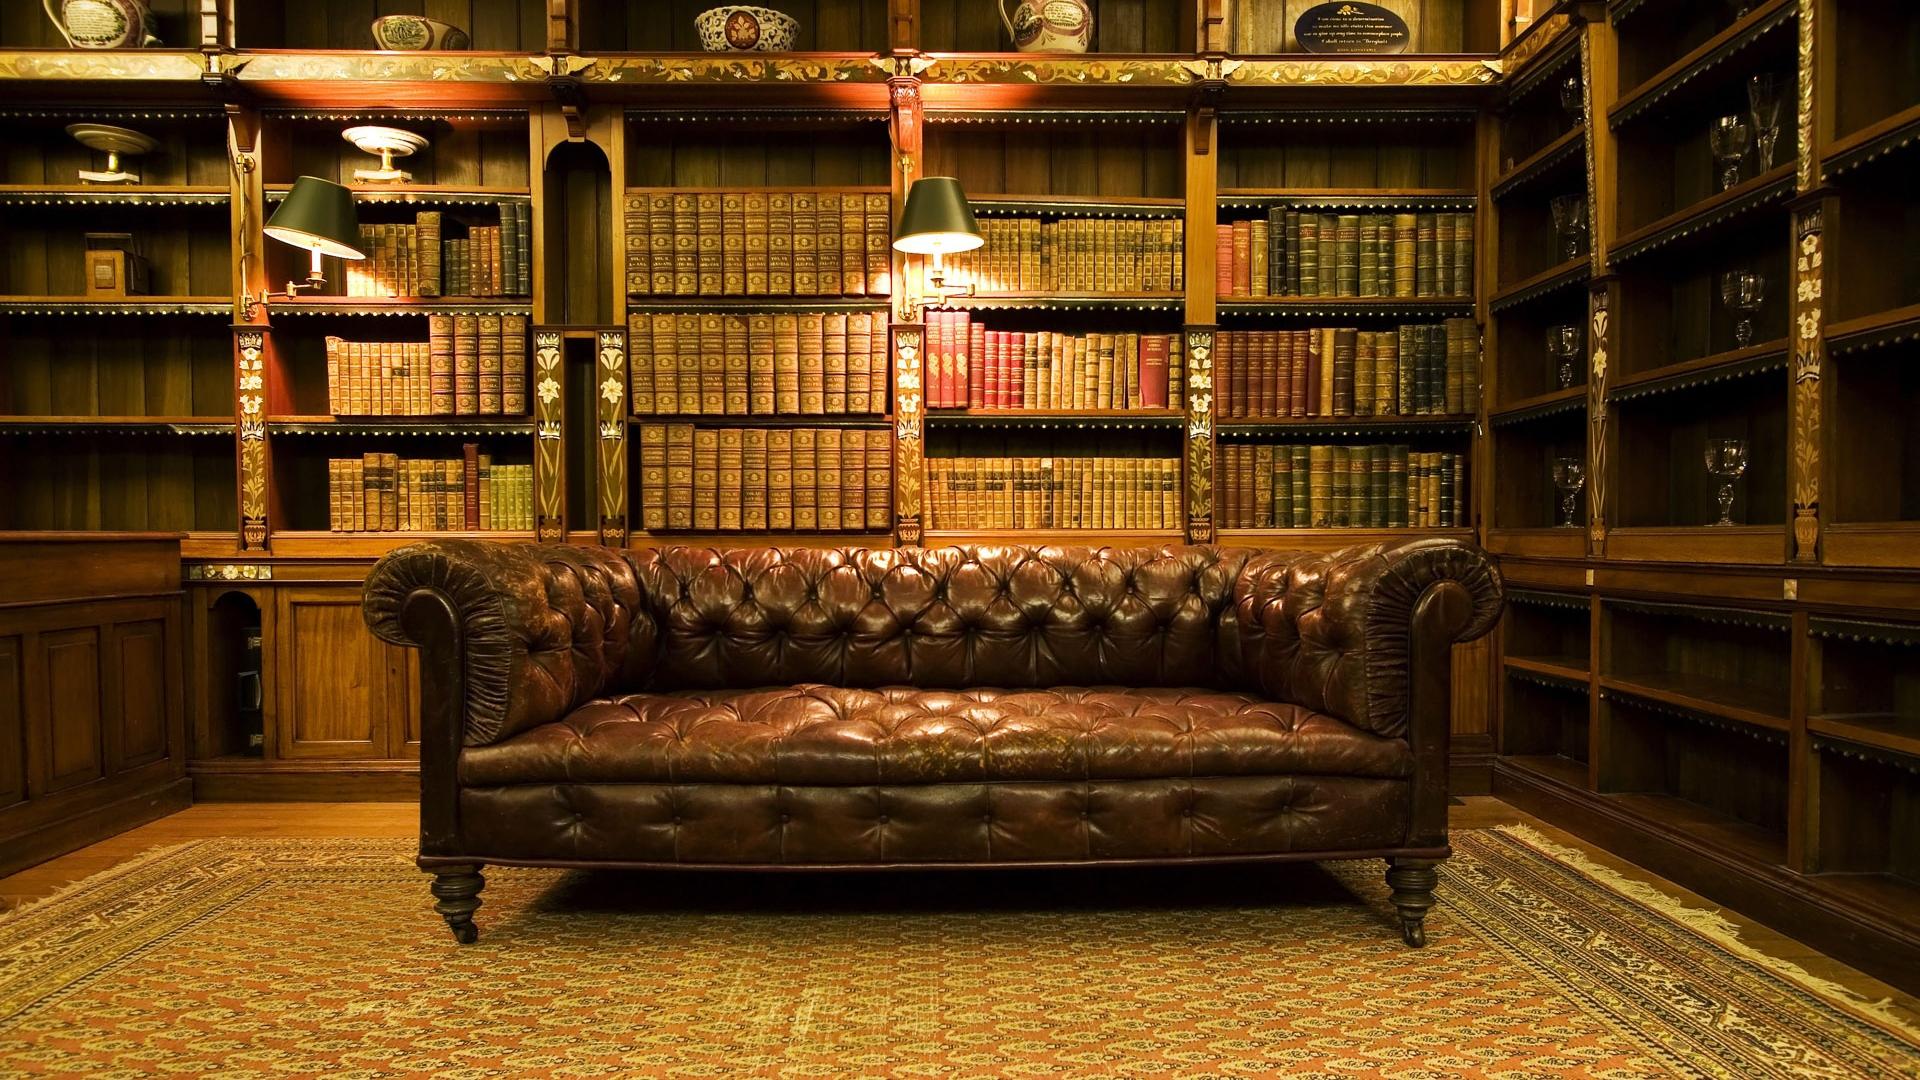 Download Wallpaper 1920x1080 Old Library, Design, Interior